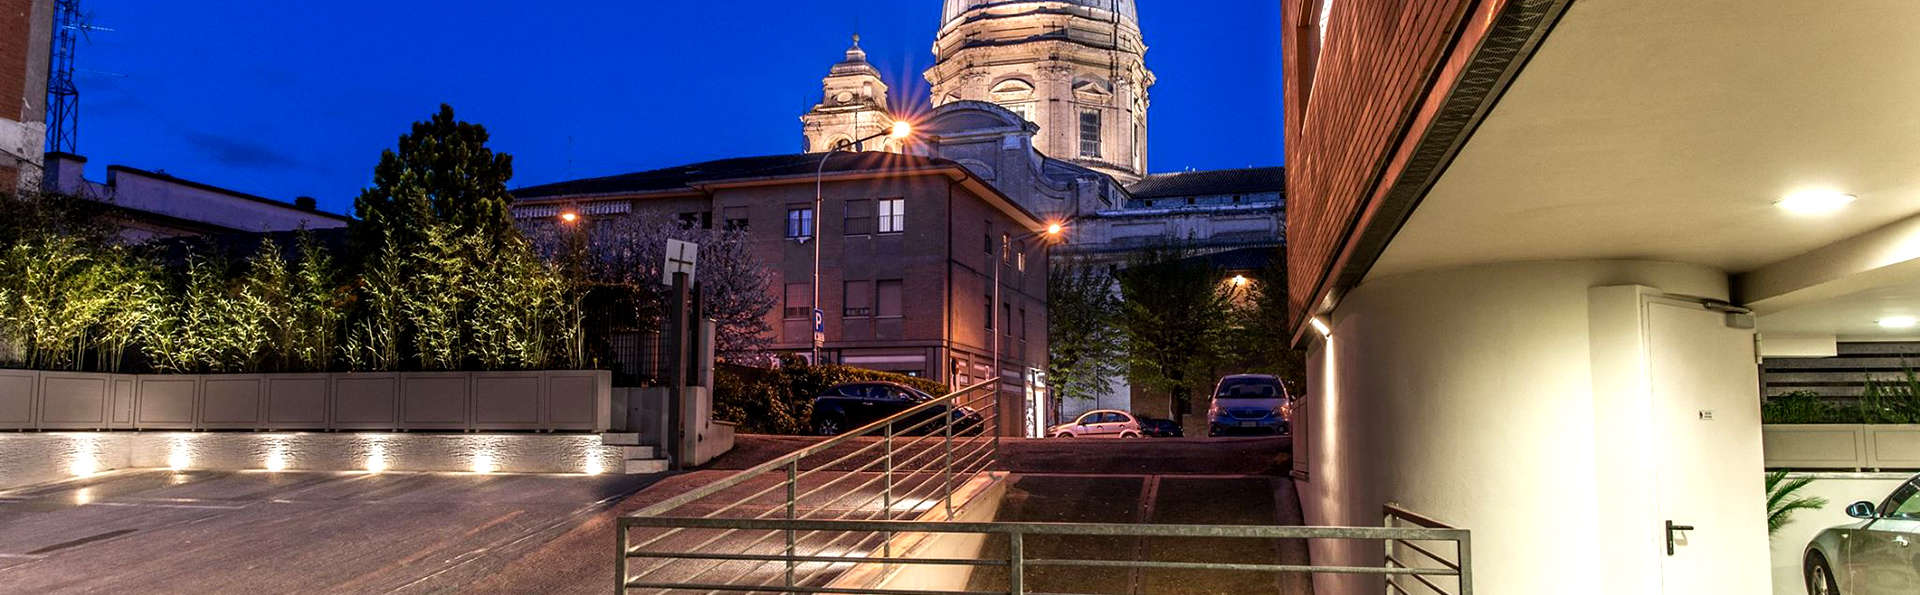 Dal Moro Gallery Hotel - Edit_View.jpg